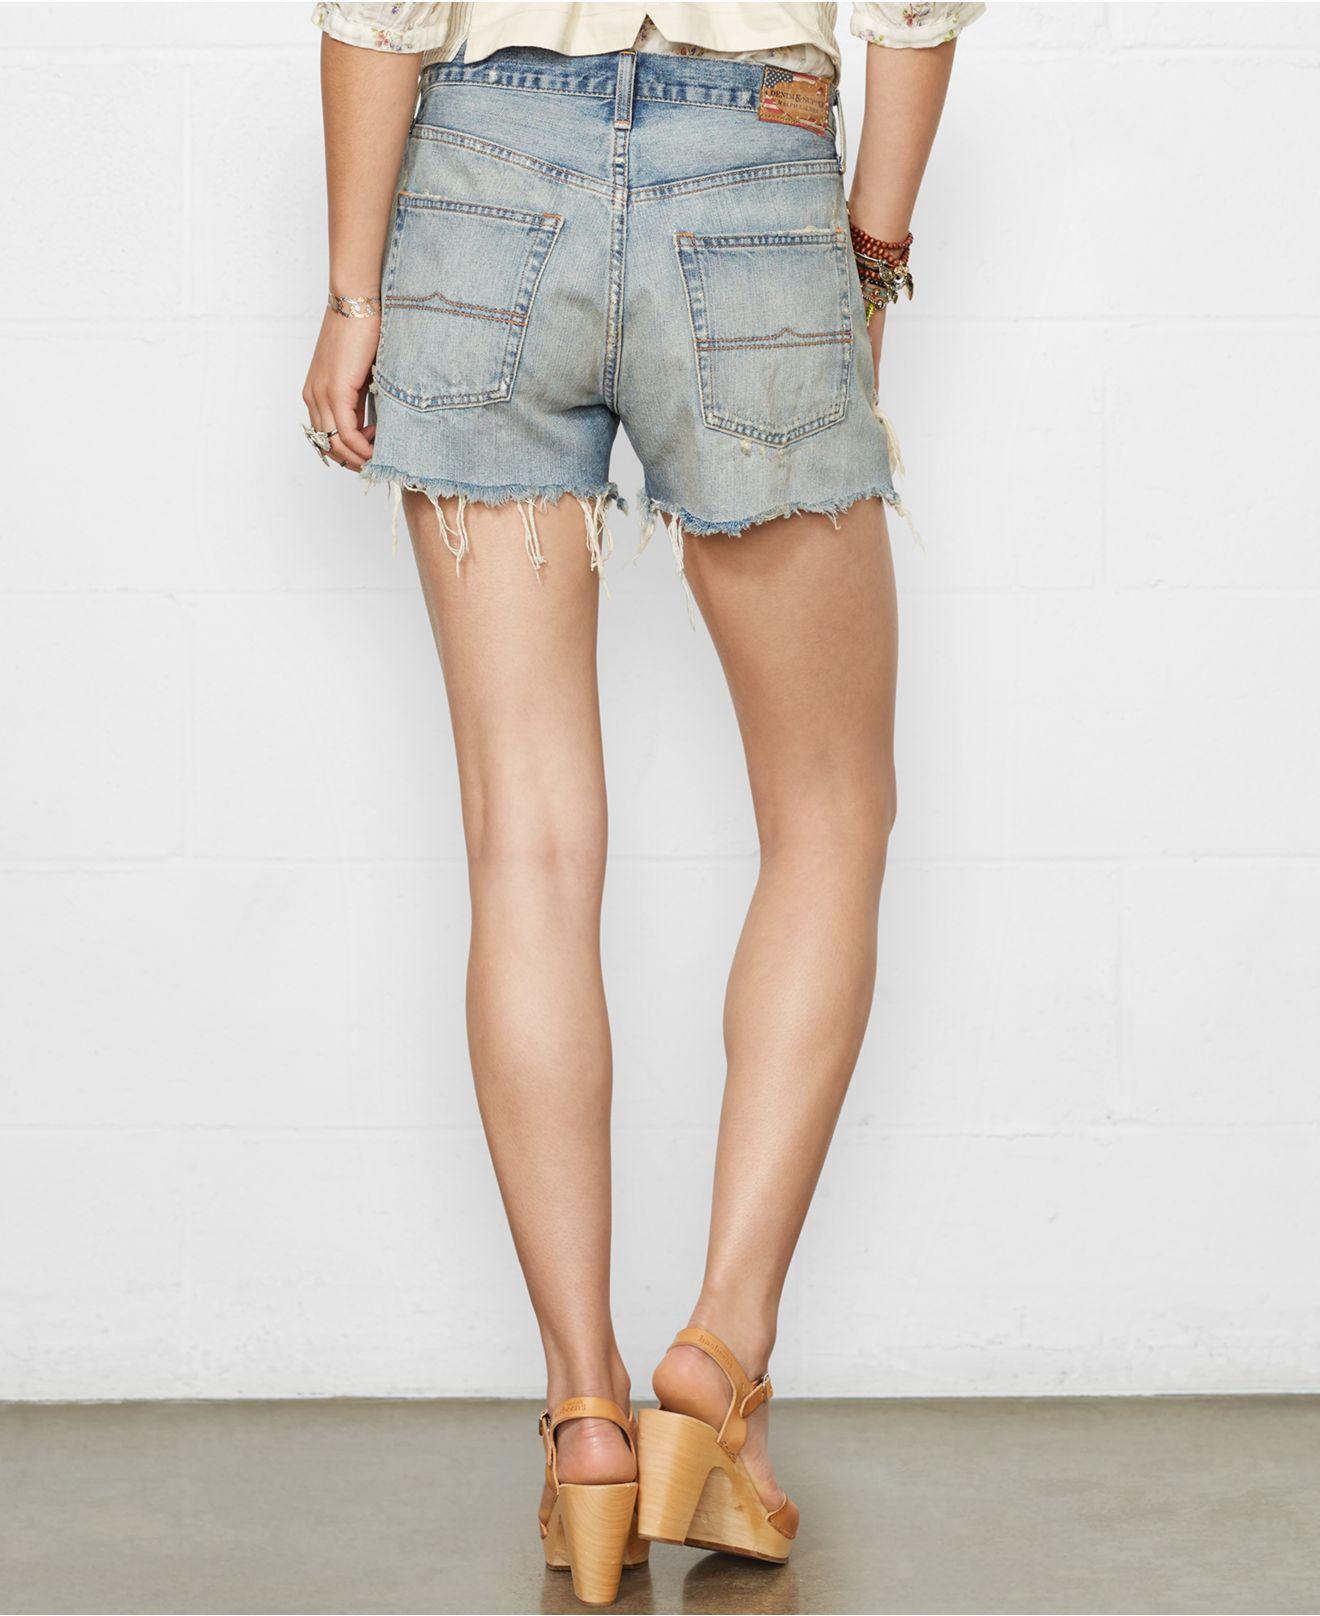 Distressed Denim Boyfriend Shorts - Hardon Clothes